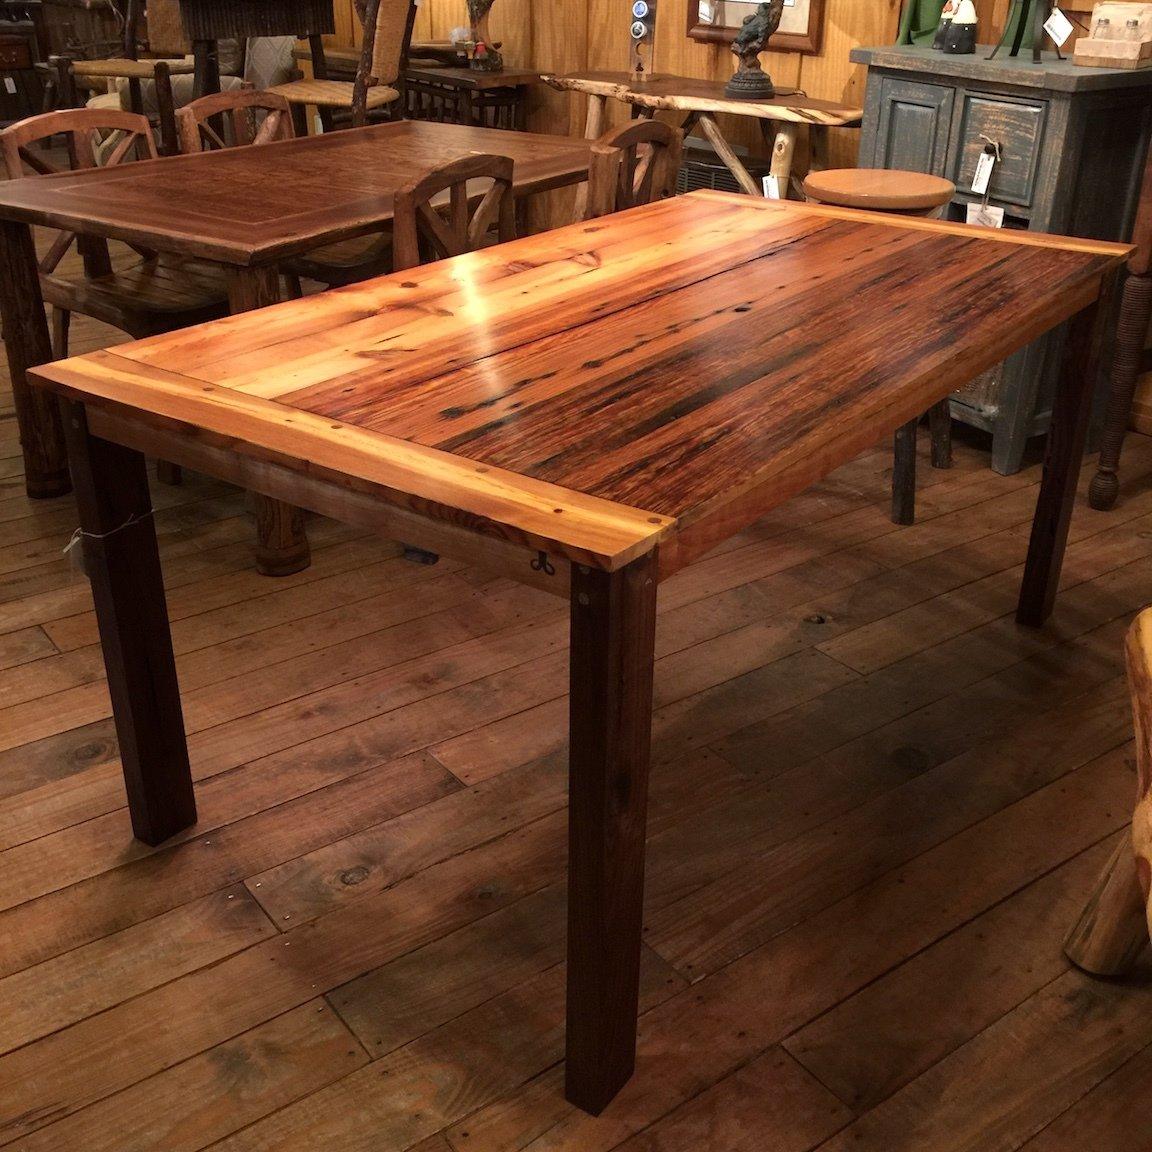 66L 36W Heart Pine Top Dining Table Walnut Legs